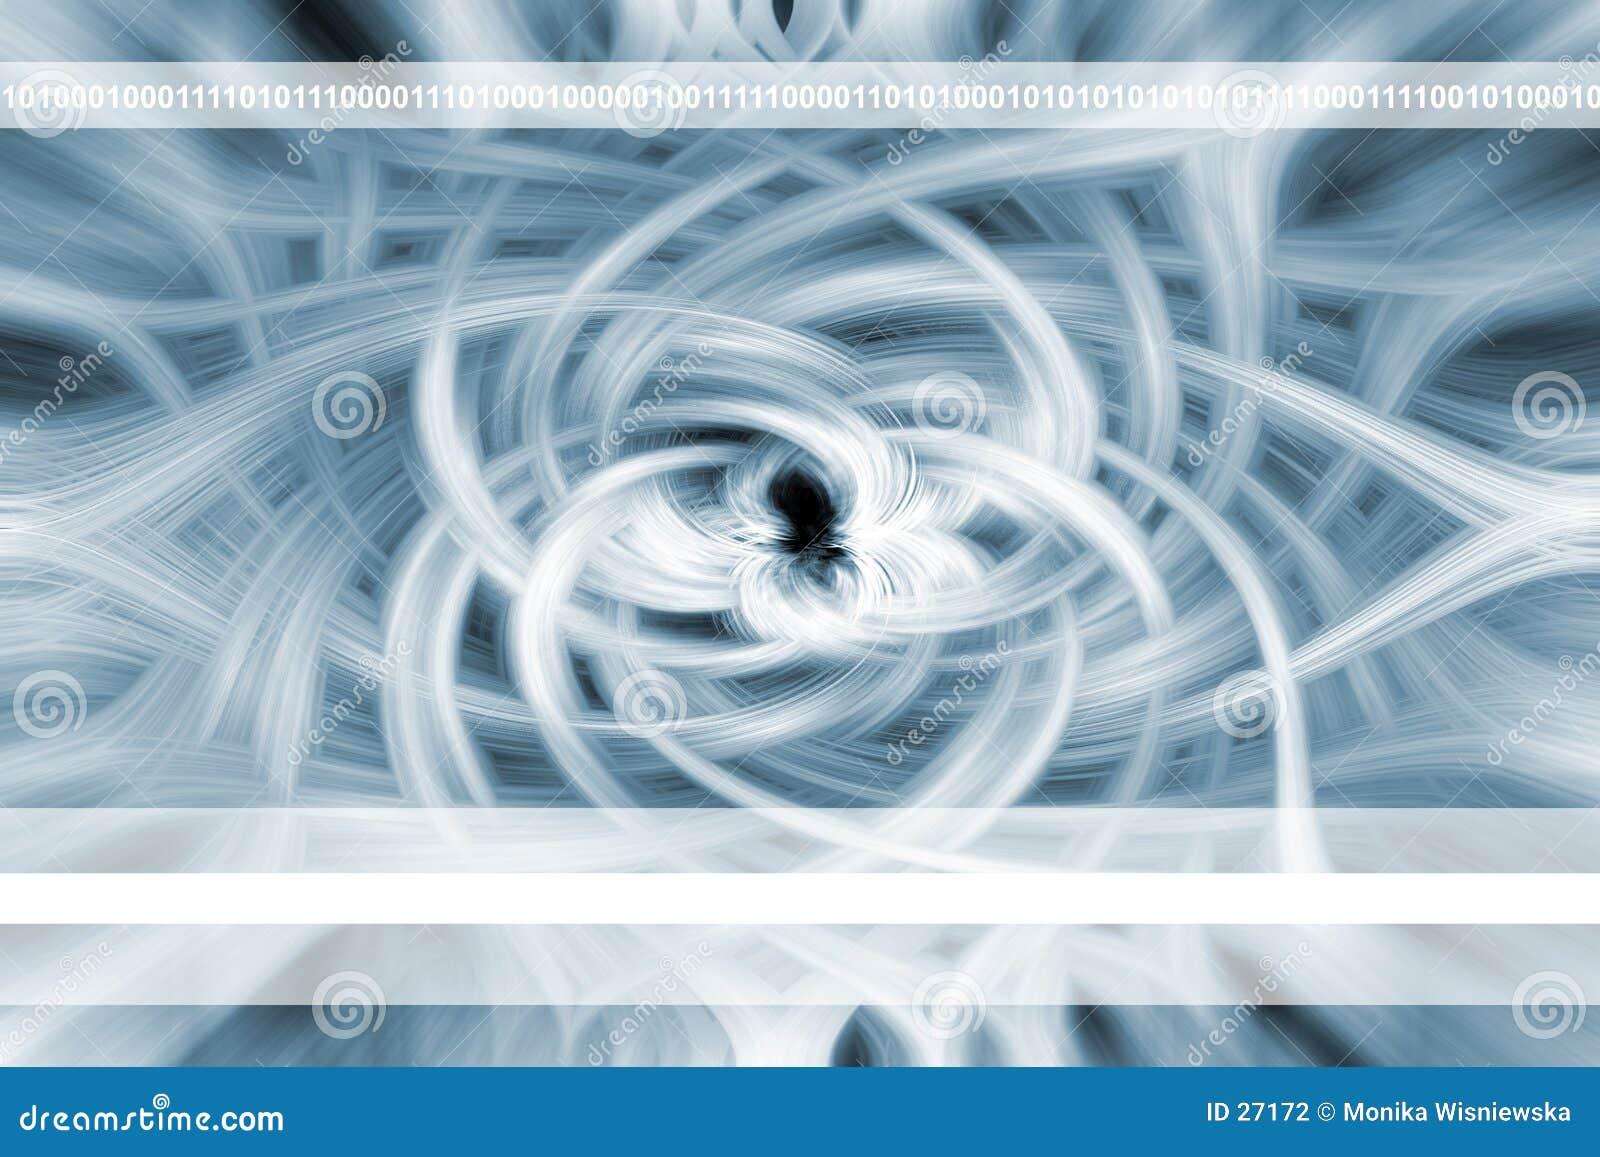 Kwiat tła abstrakcyjne